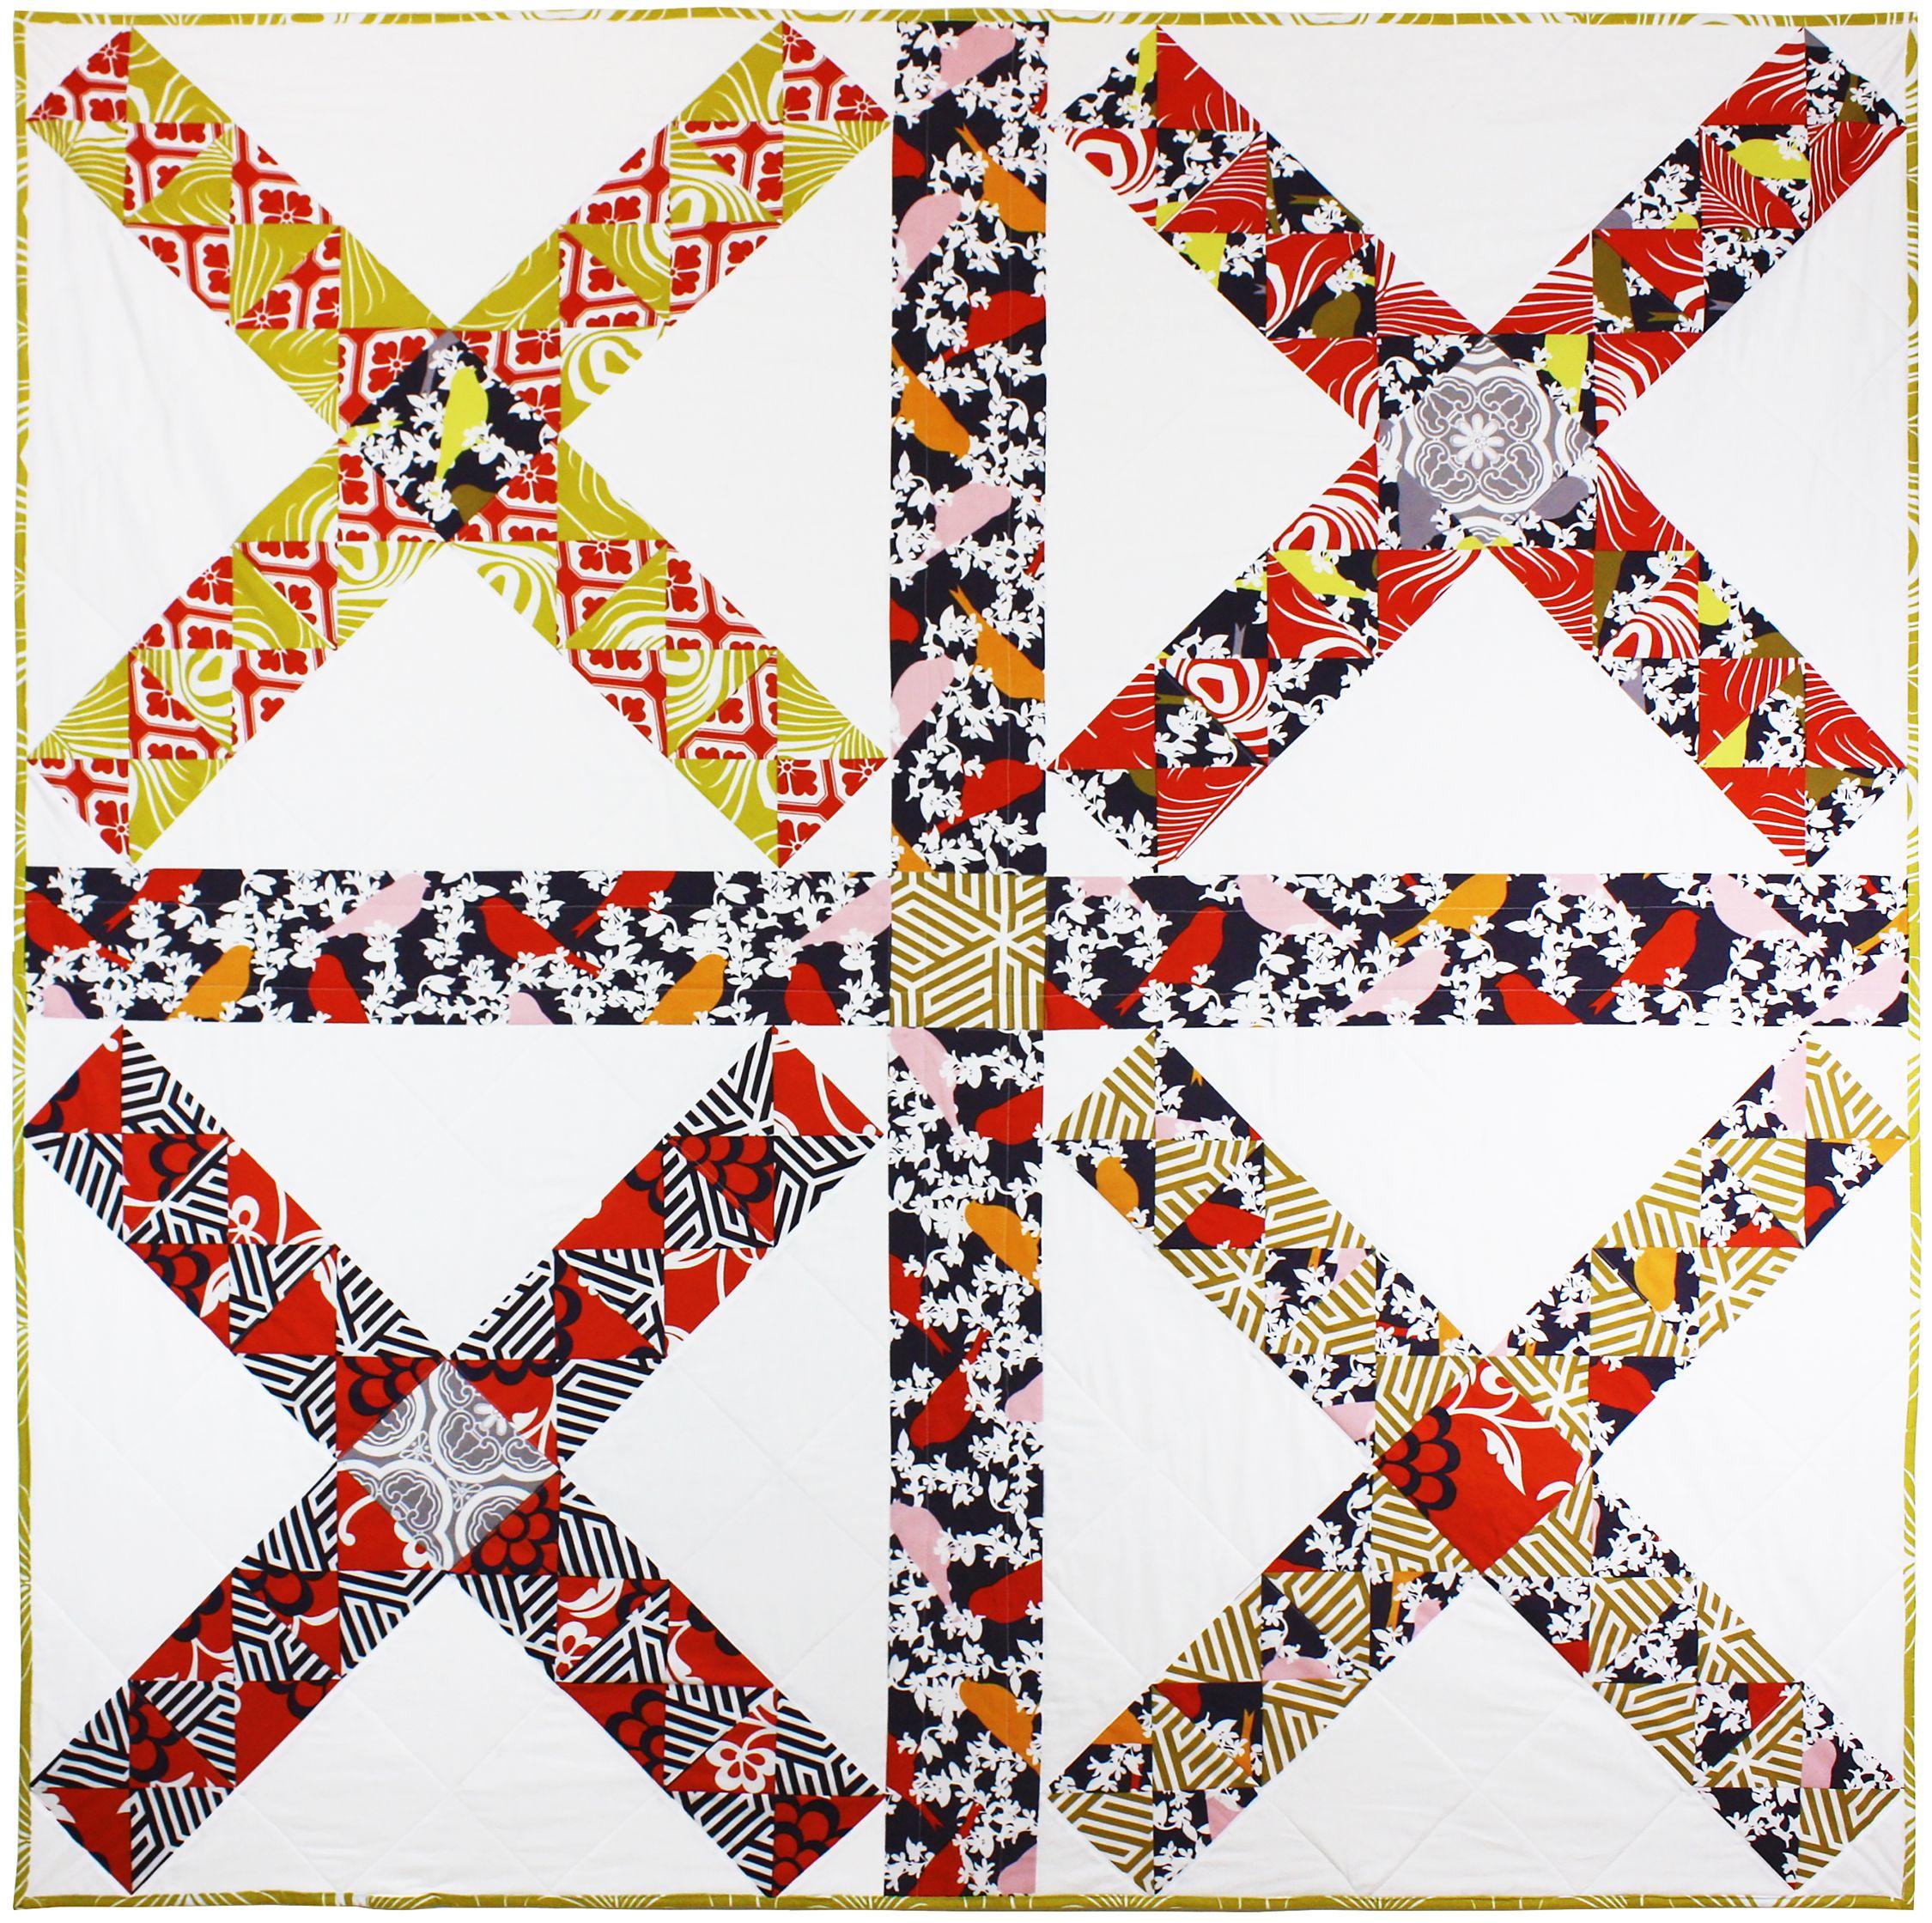 Tara Faughnan Barn Door Quilt 2015 Collaboration With Michael Miller